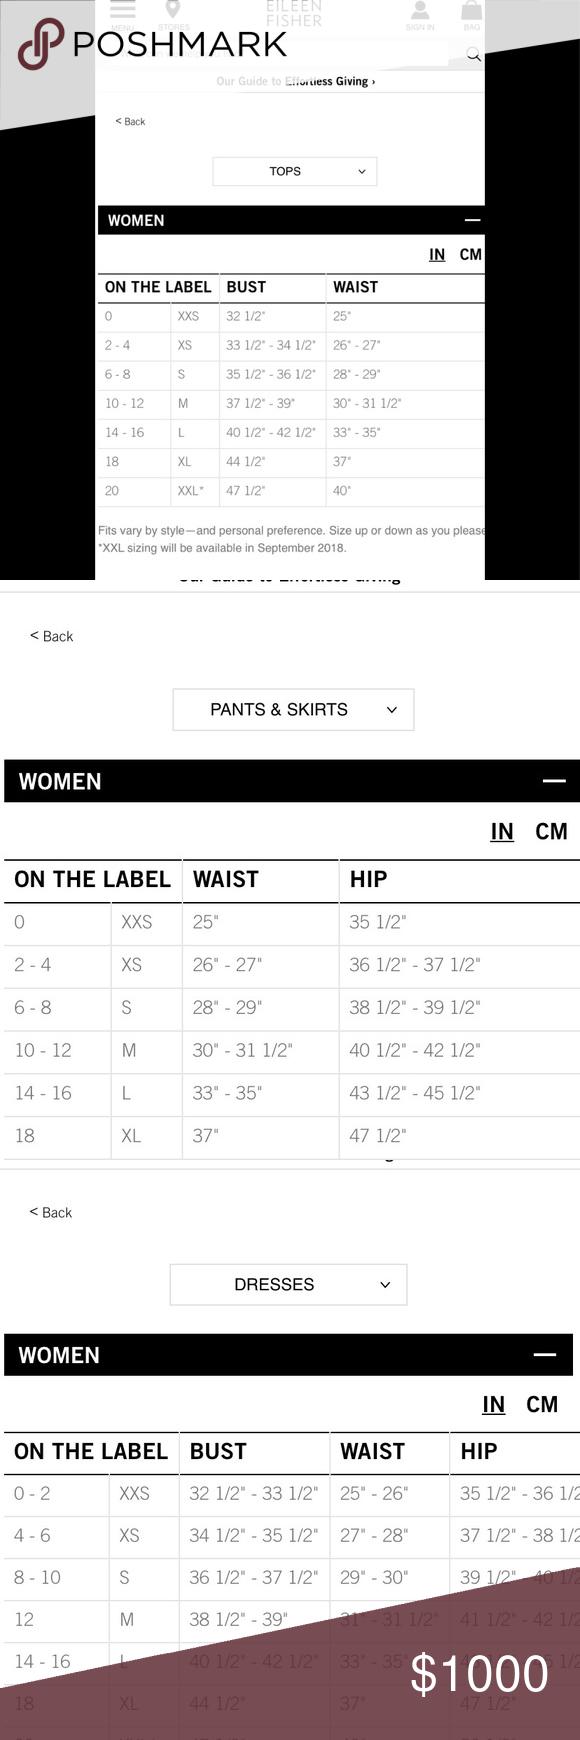 Eileen Fisher Size Chart Size Chart Eileen Fisher Dress Backs